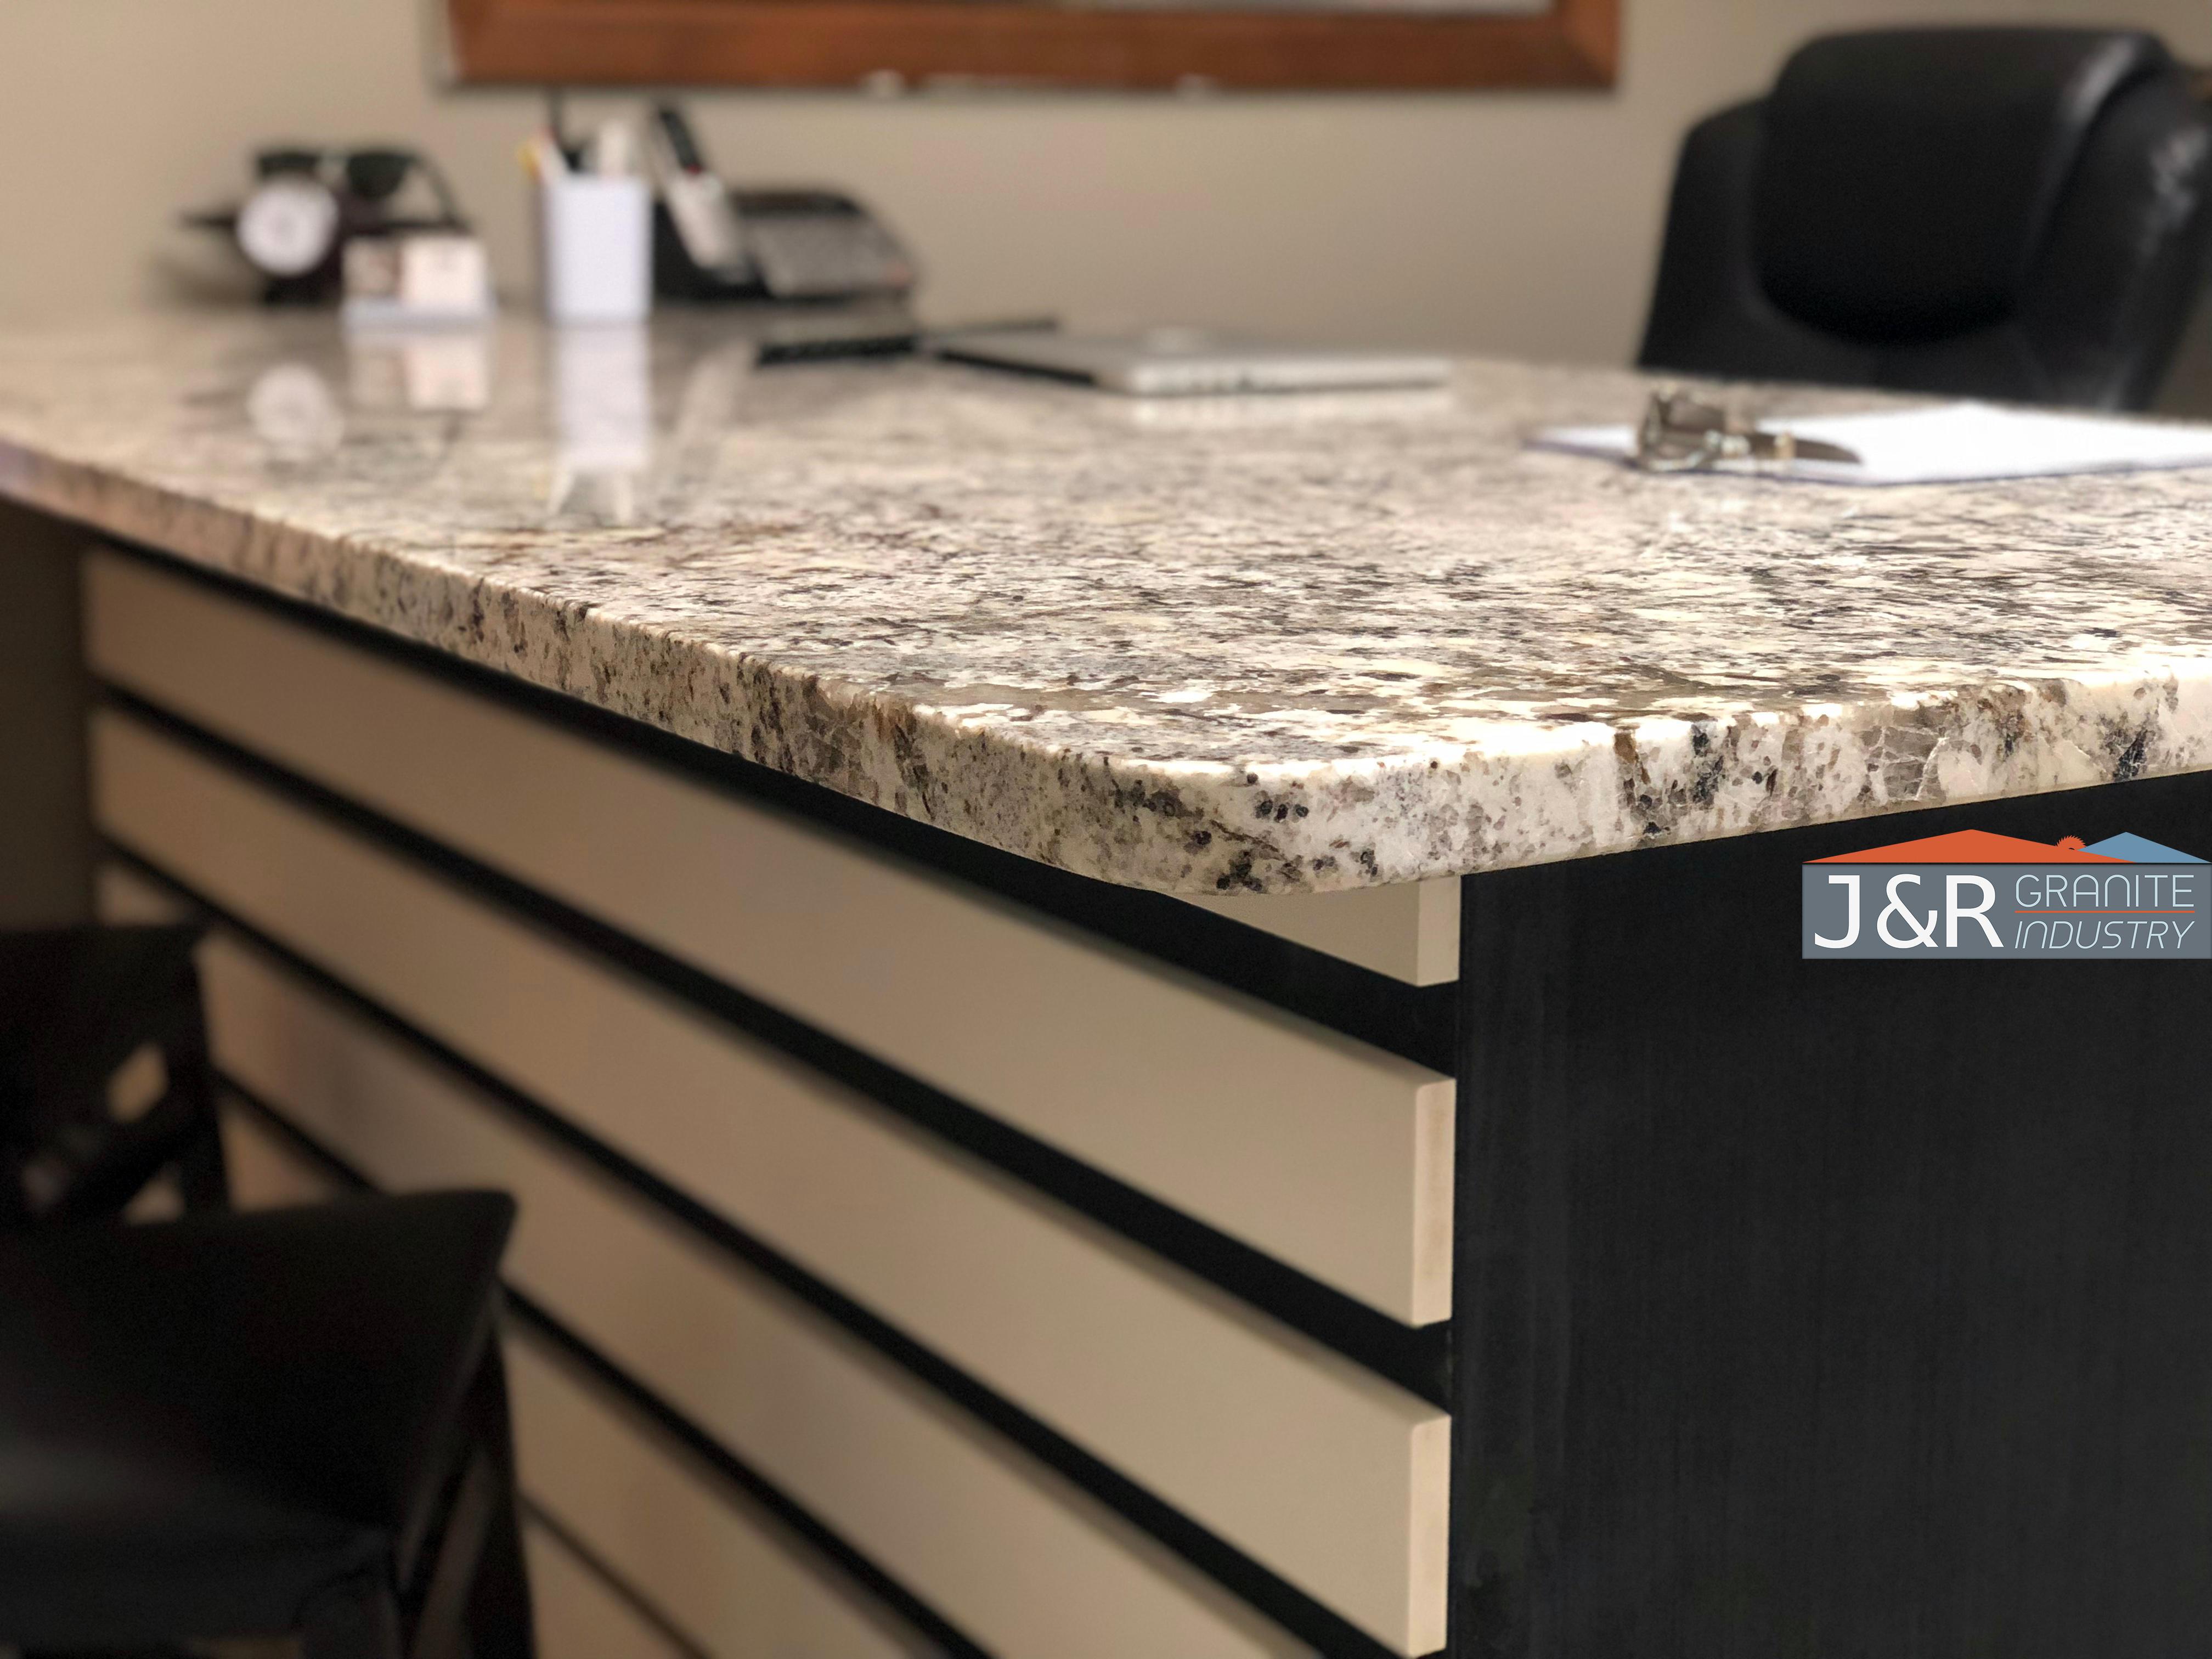 J and R Granite Industry image 2